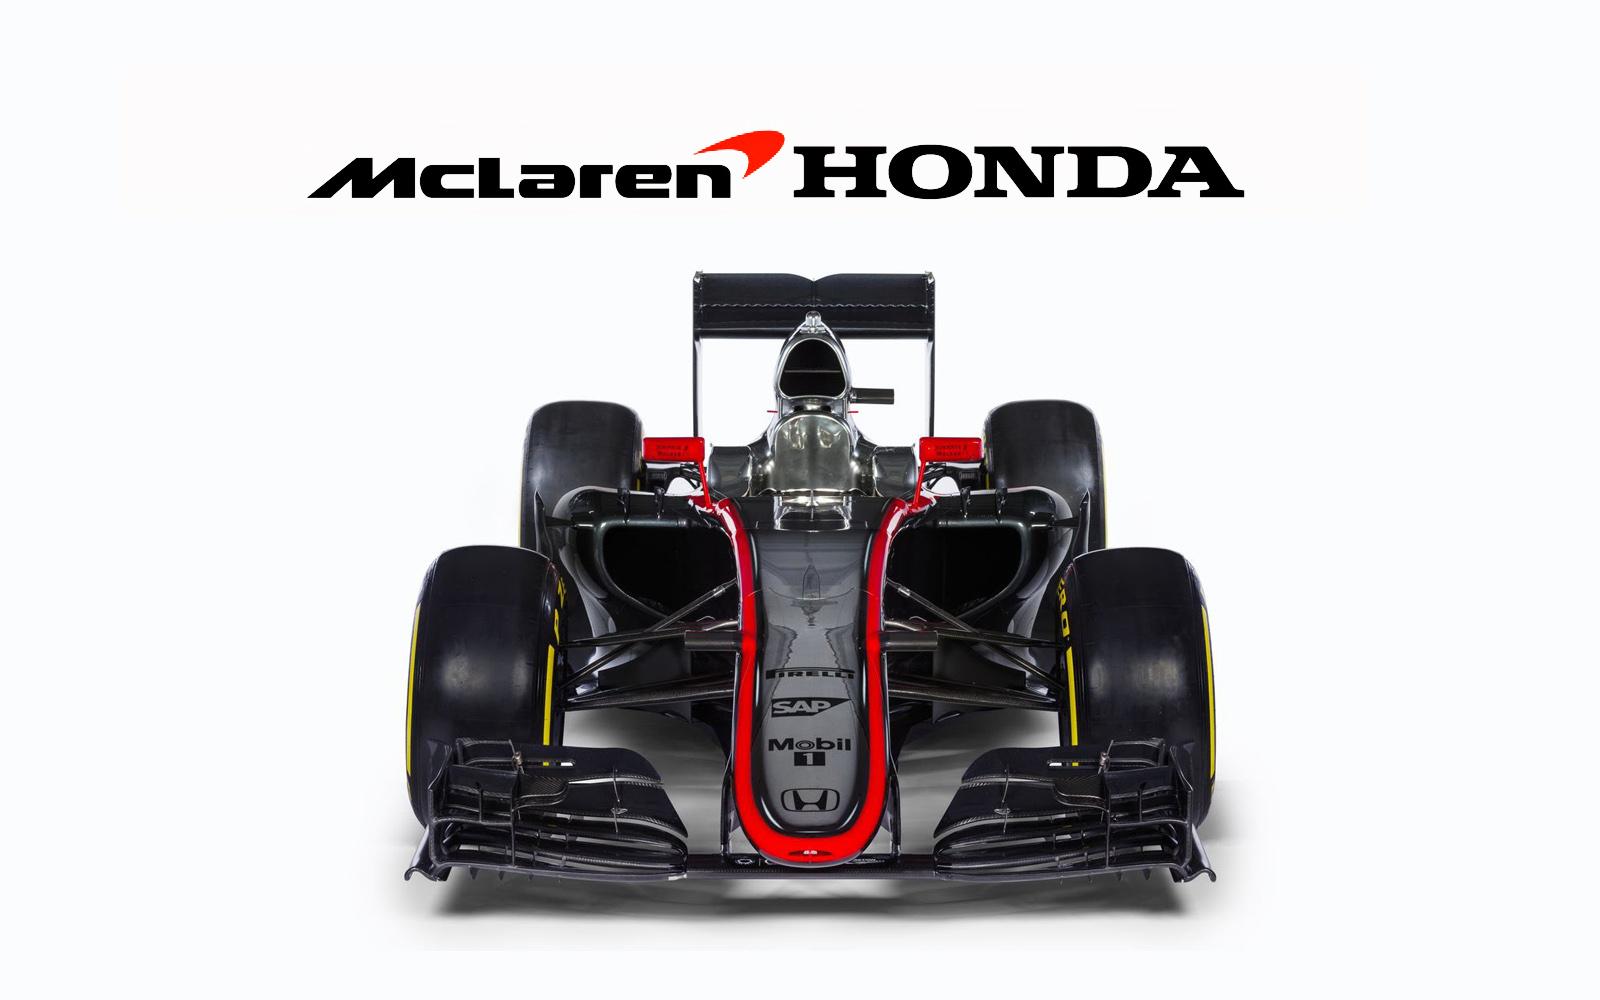 Mclaren Formula 1 Wallpaper 2015 8 1600x1000